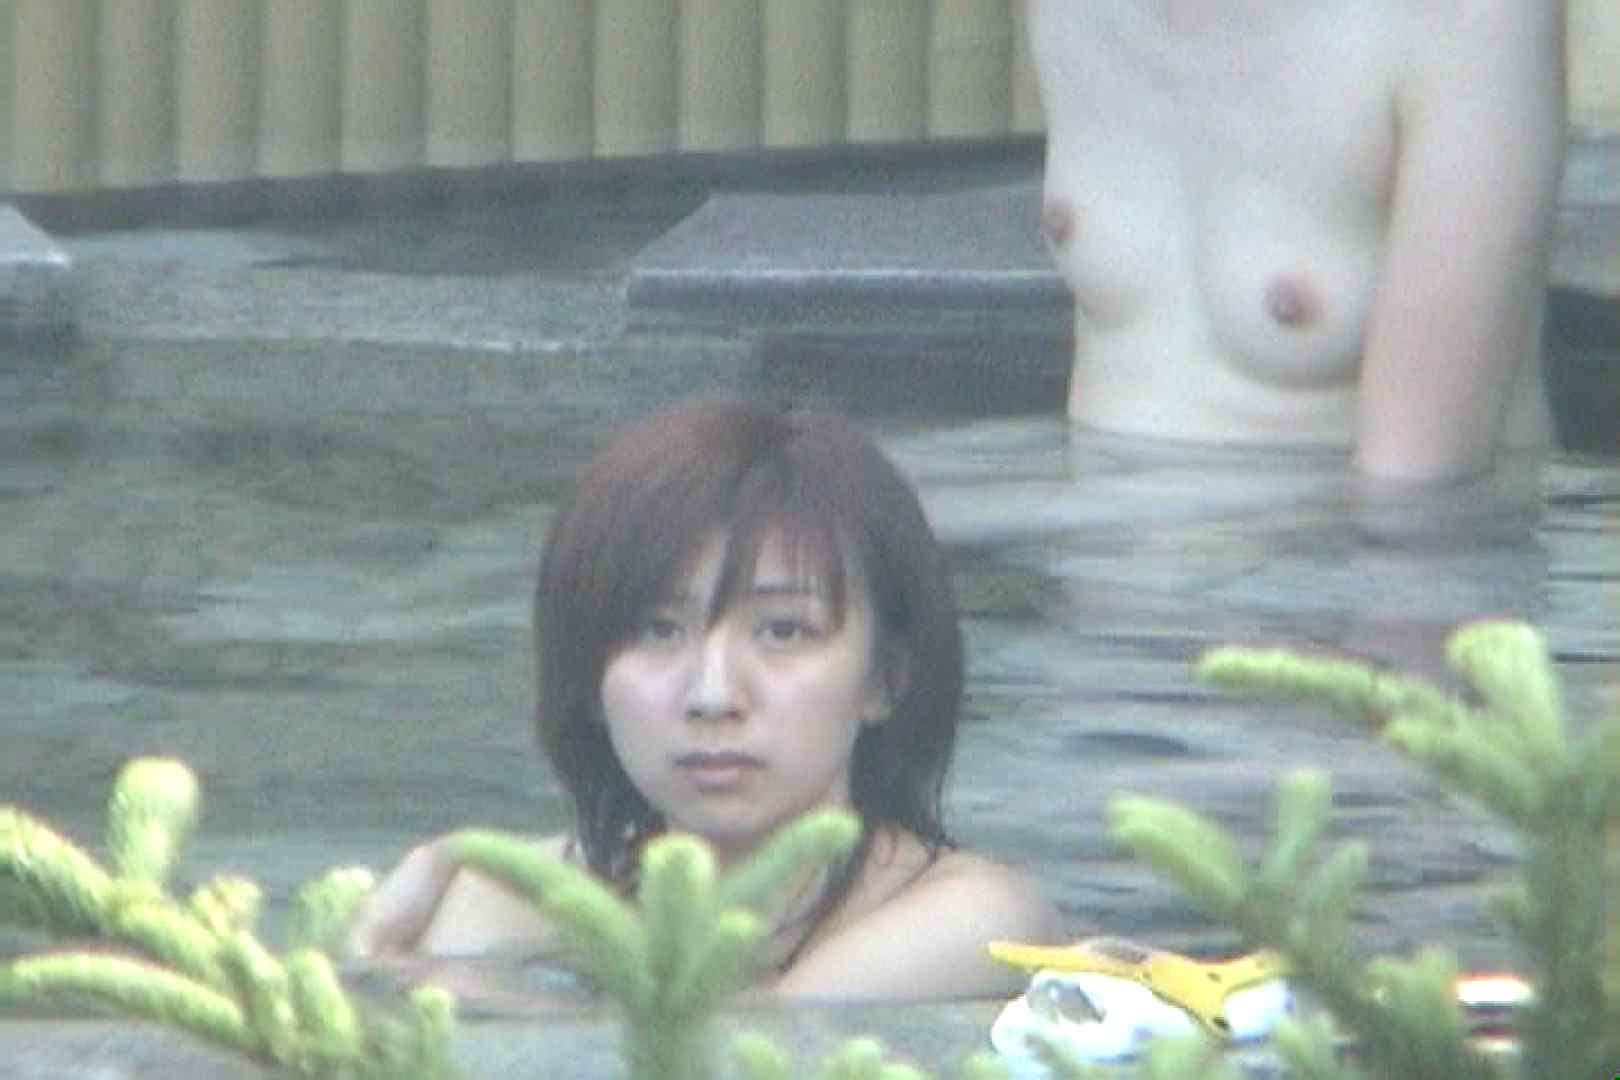 Aquaな露天風呂Vol.77【VIP限定】 盗撮   OLセックス  107画像 70